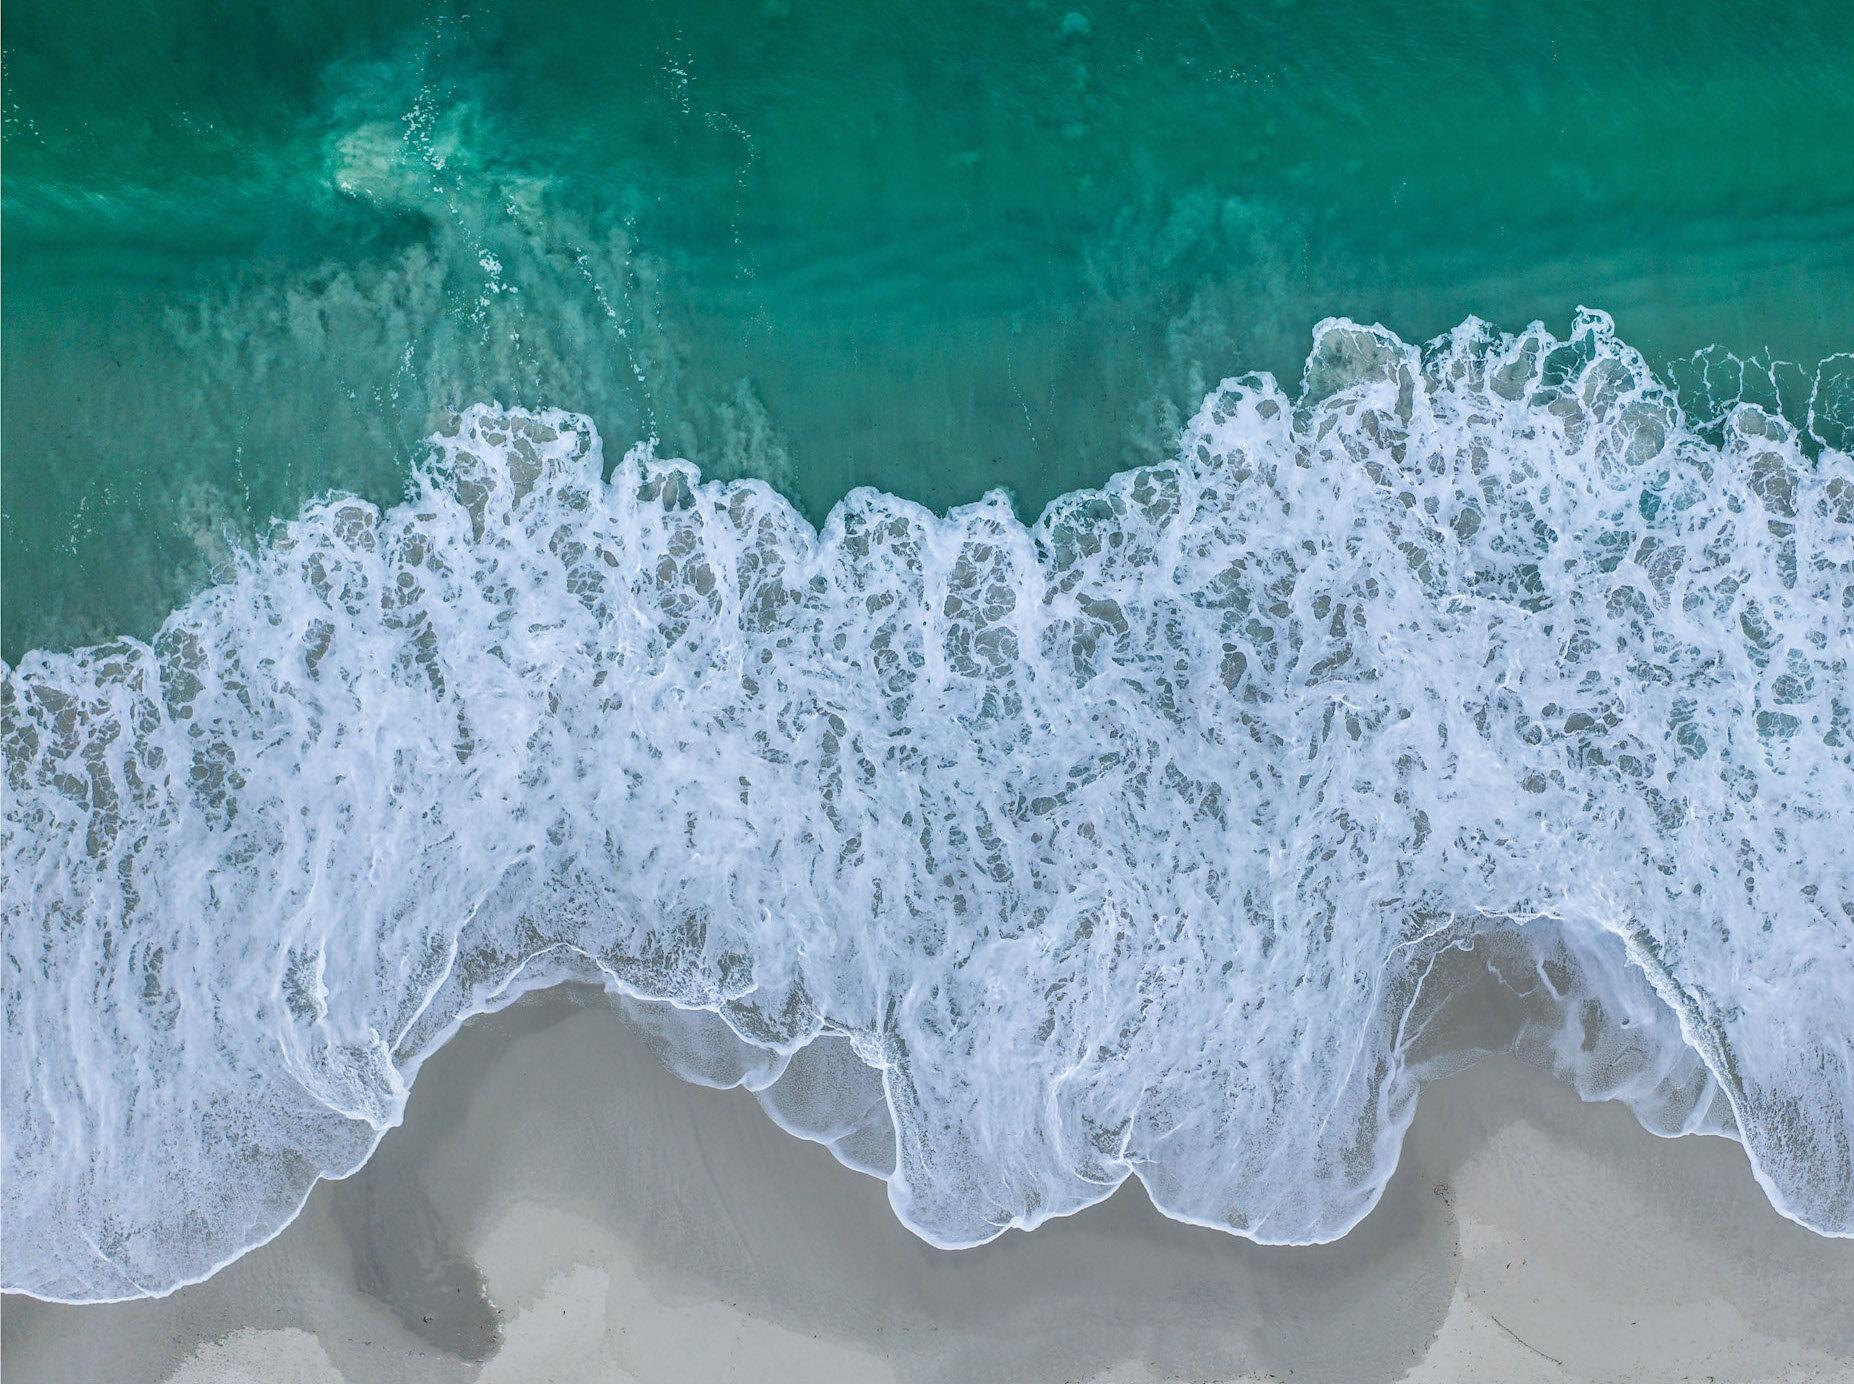 David Ondaatje     Carmel Beach #1  44 x 34 inch Archival Pigment Print